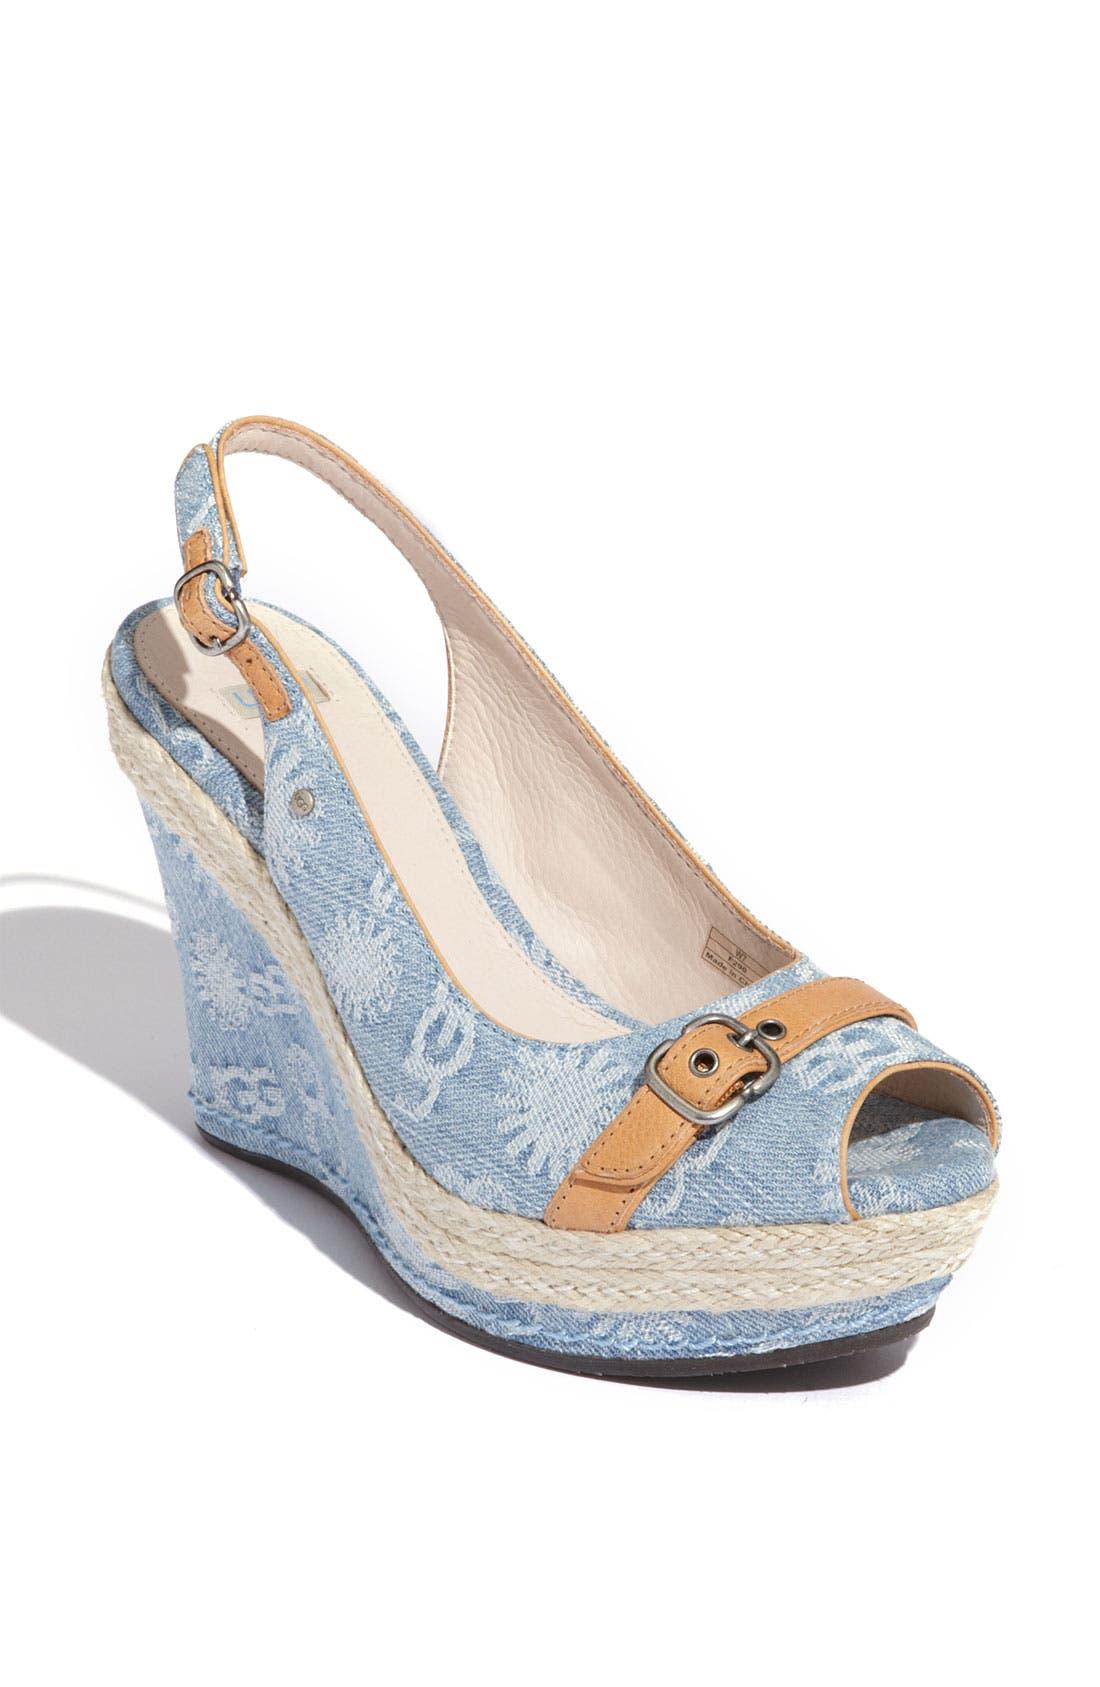 Alternate Image 1 Selected - UGG® Australia 'Noella' Sandal